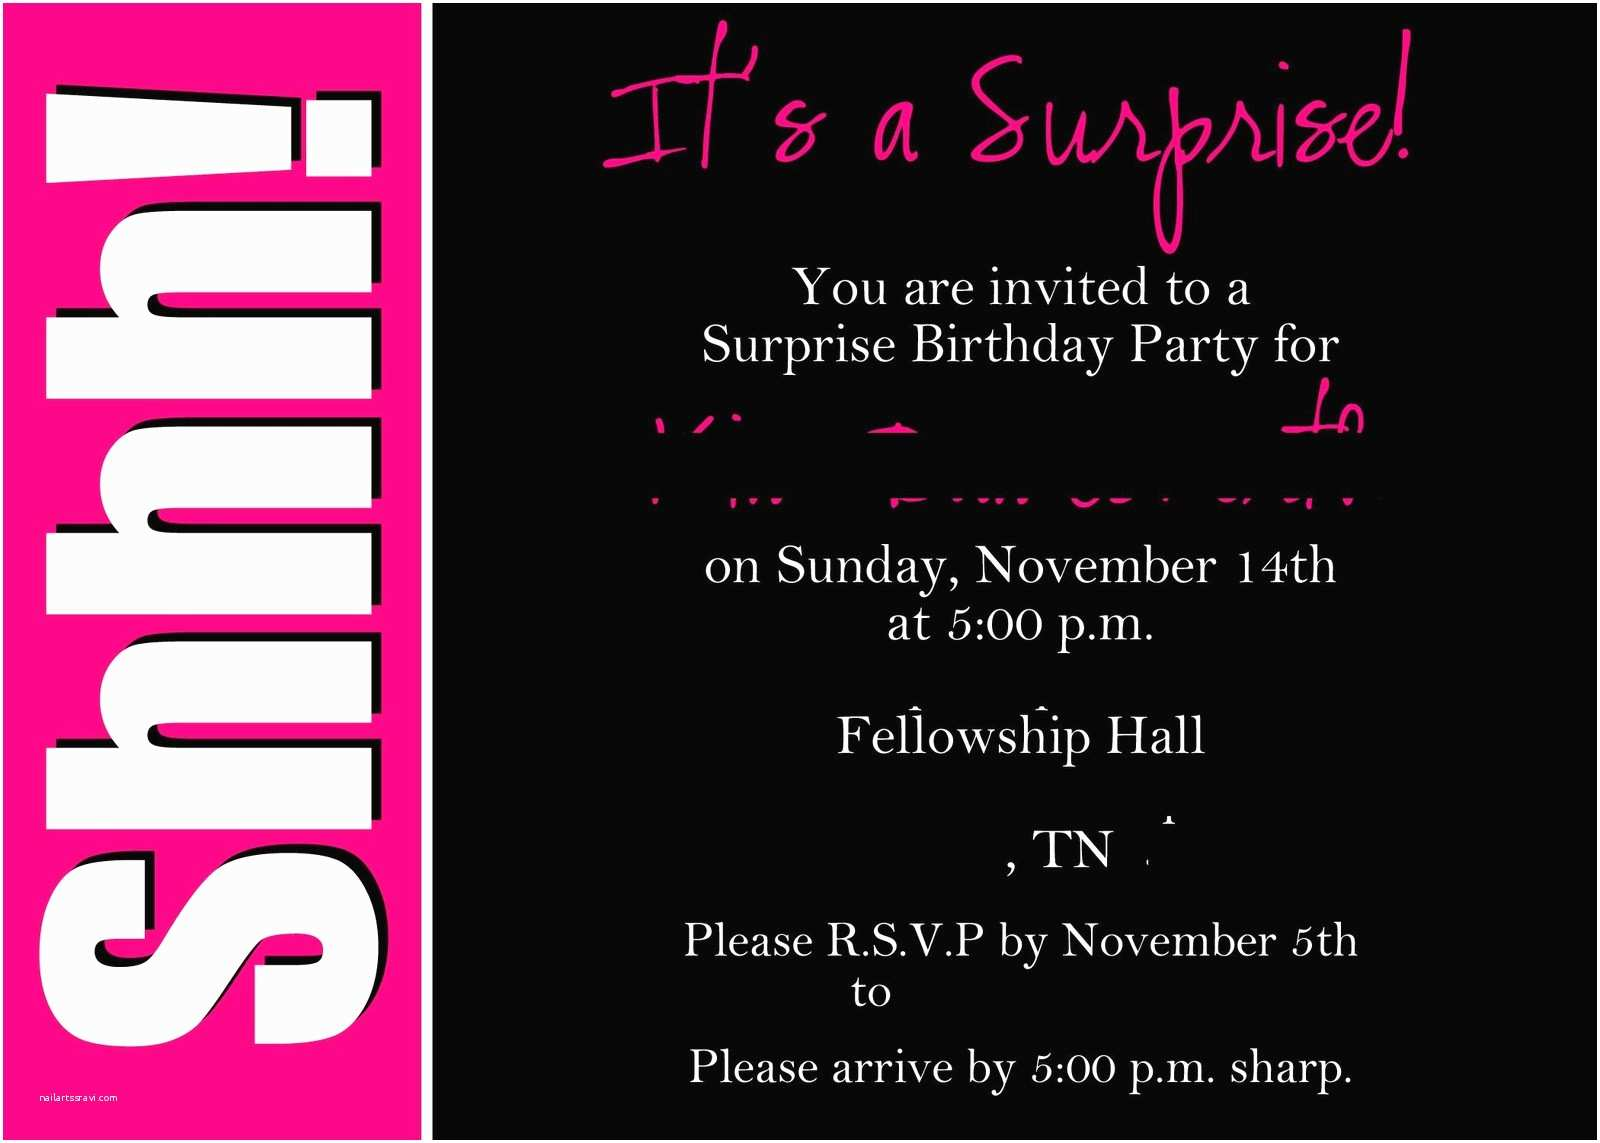 Surprise Party Invitation  Surprise Party Invitation Wording